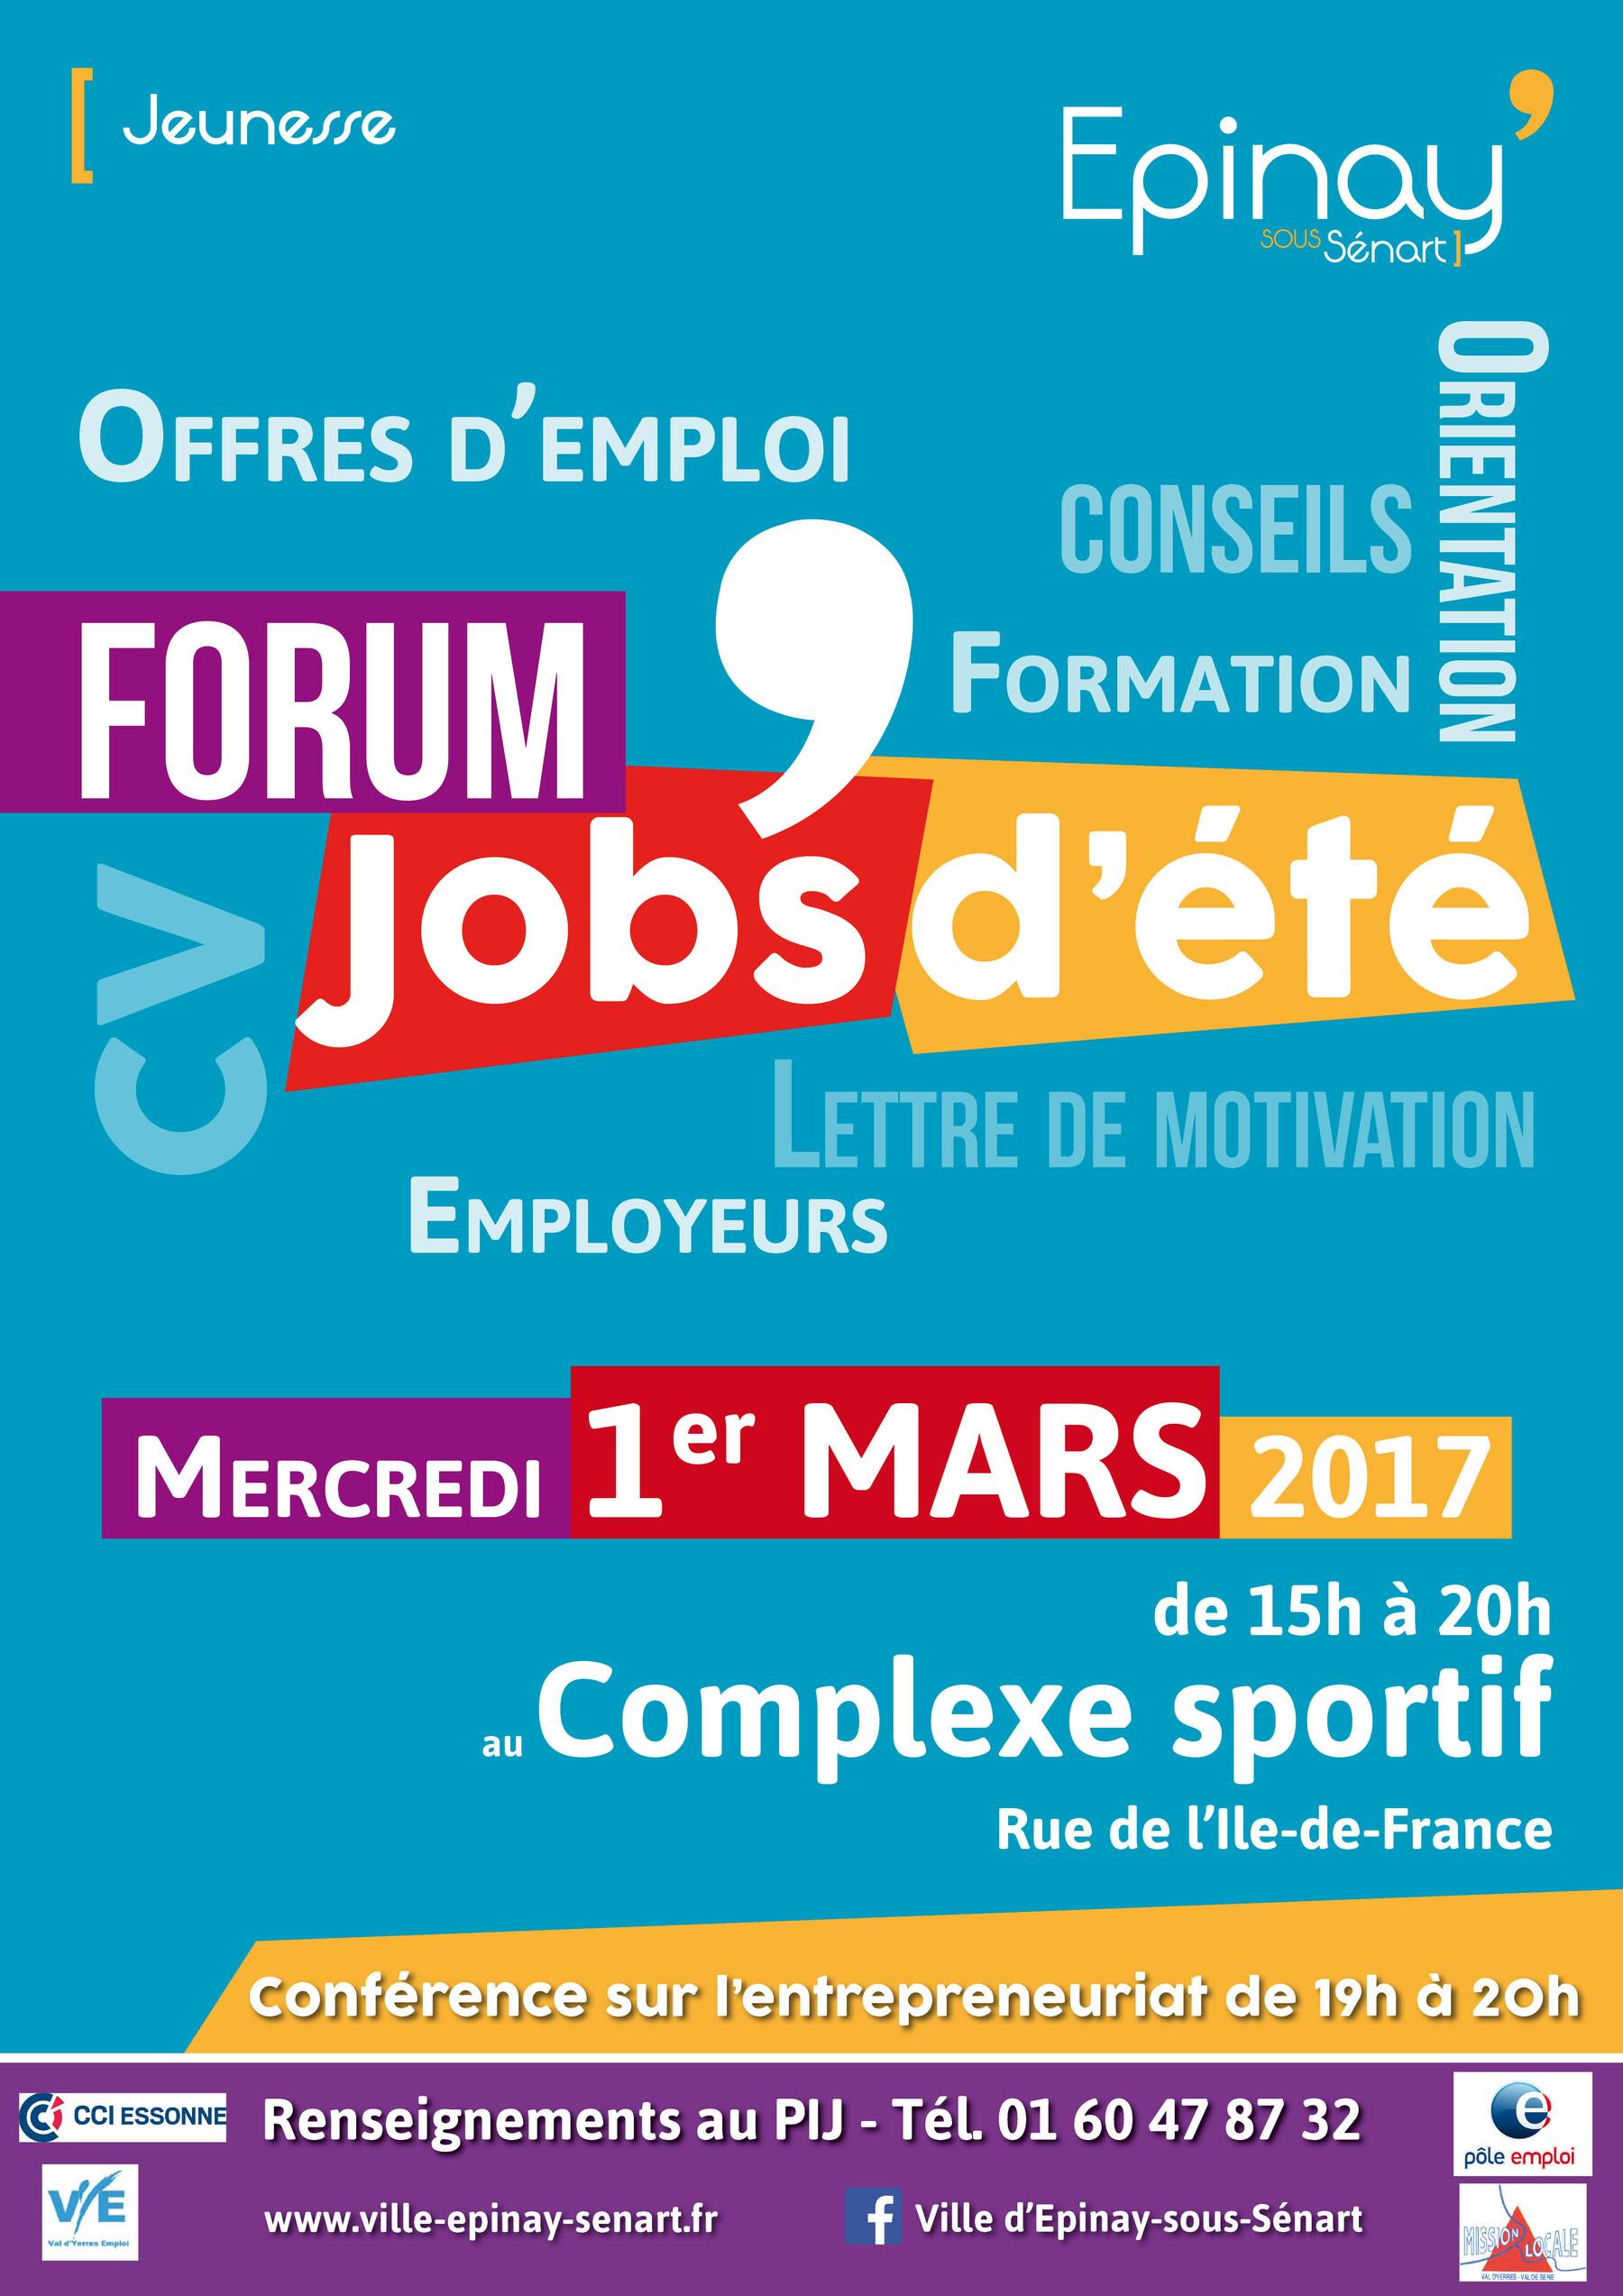 ev u00e9nement   forum jobs d u2019 u00e9t u00e9  u2022 epinay